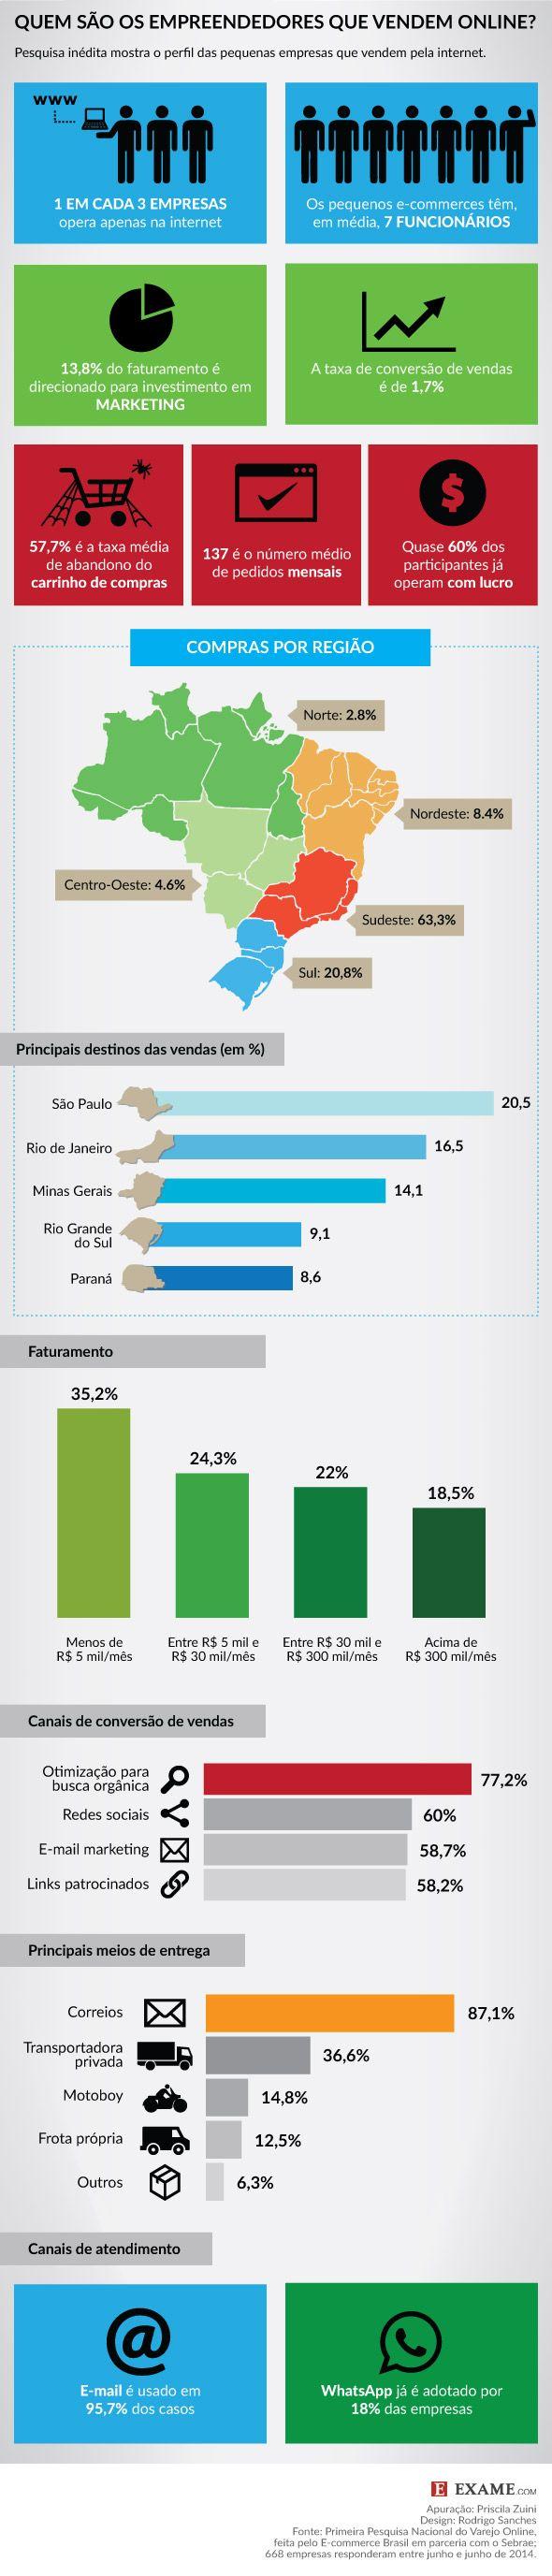 O raio x dos pequenos e-commerces brasileiros. Estudo mostra as principais características das pequenas empresas que vendem pela internet.